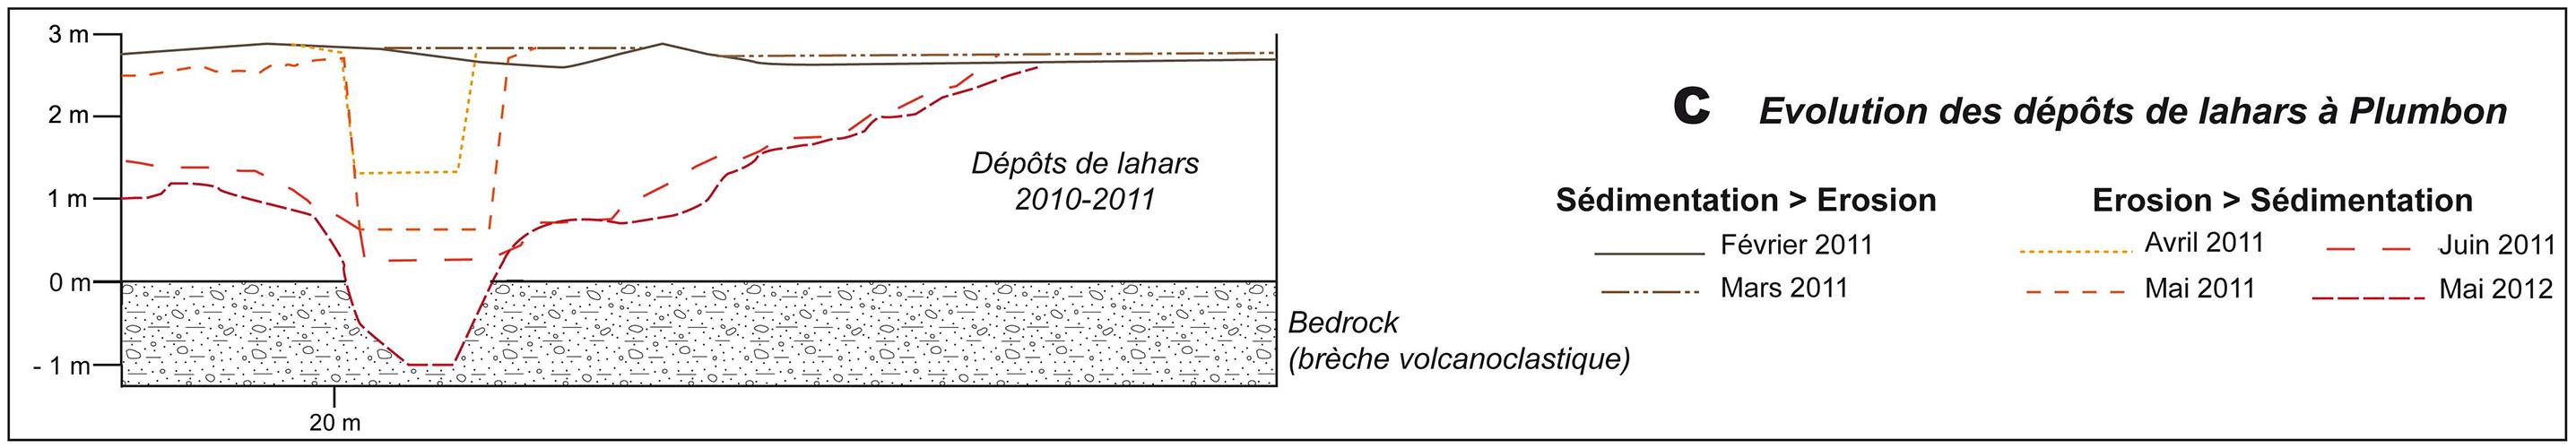 Édouard de Bélizal — érosion et sédimentation